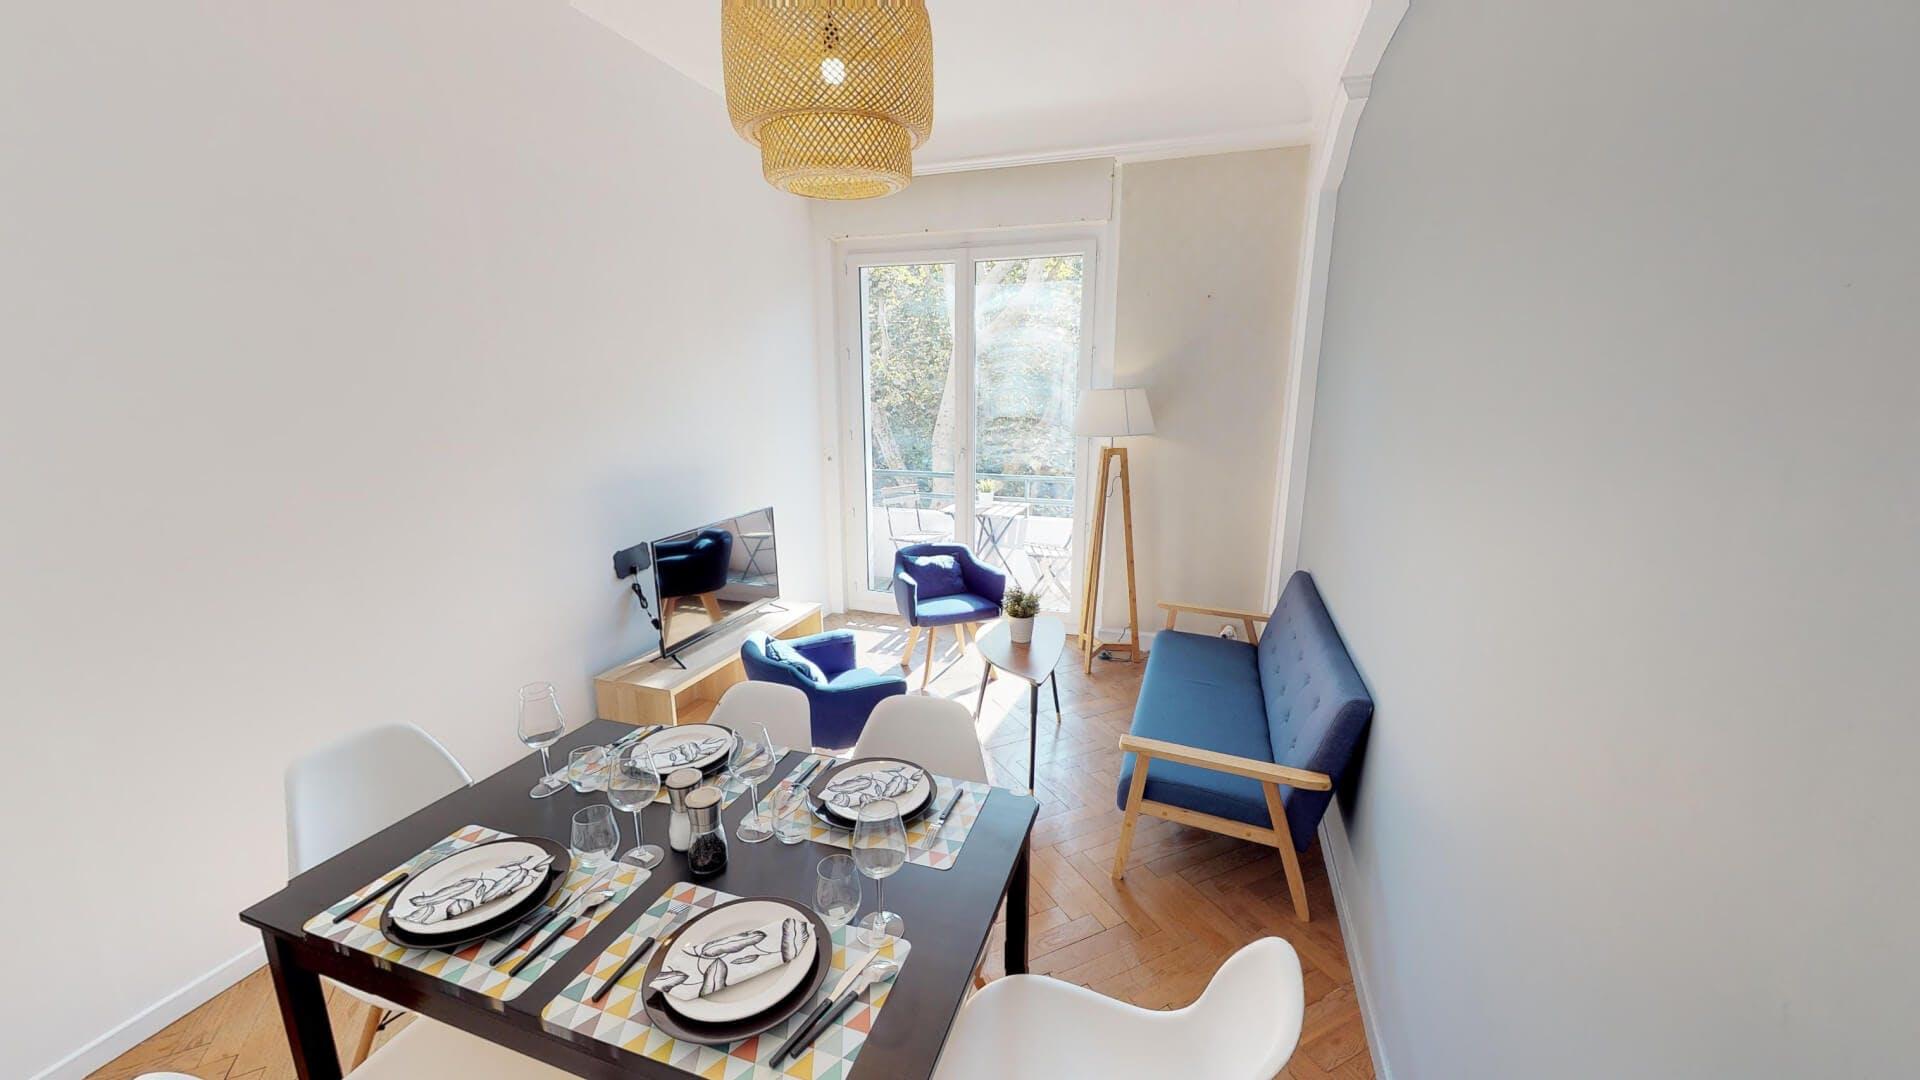 5 Residents   Vauban   Radiant Urban Apt. - Incl. Terrace